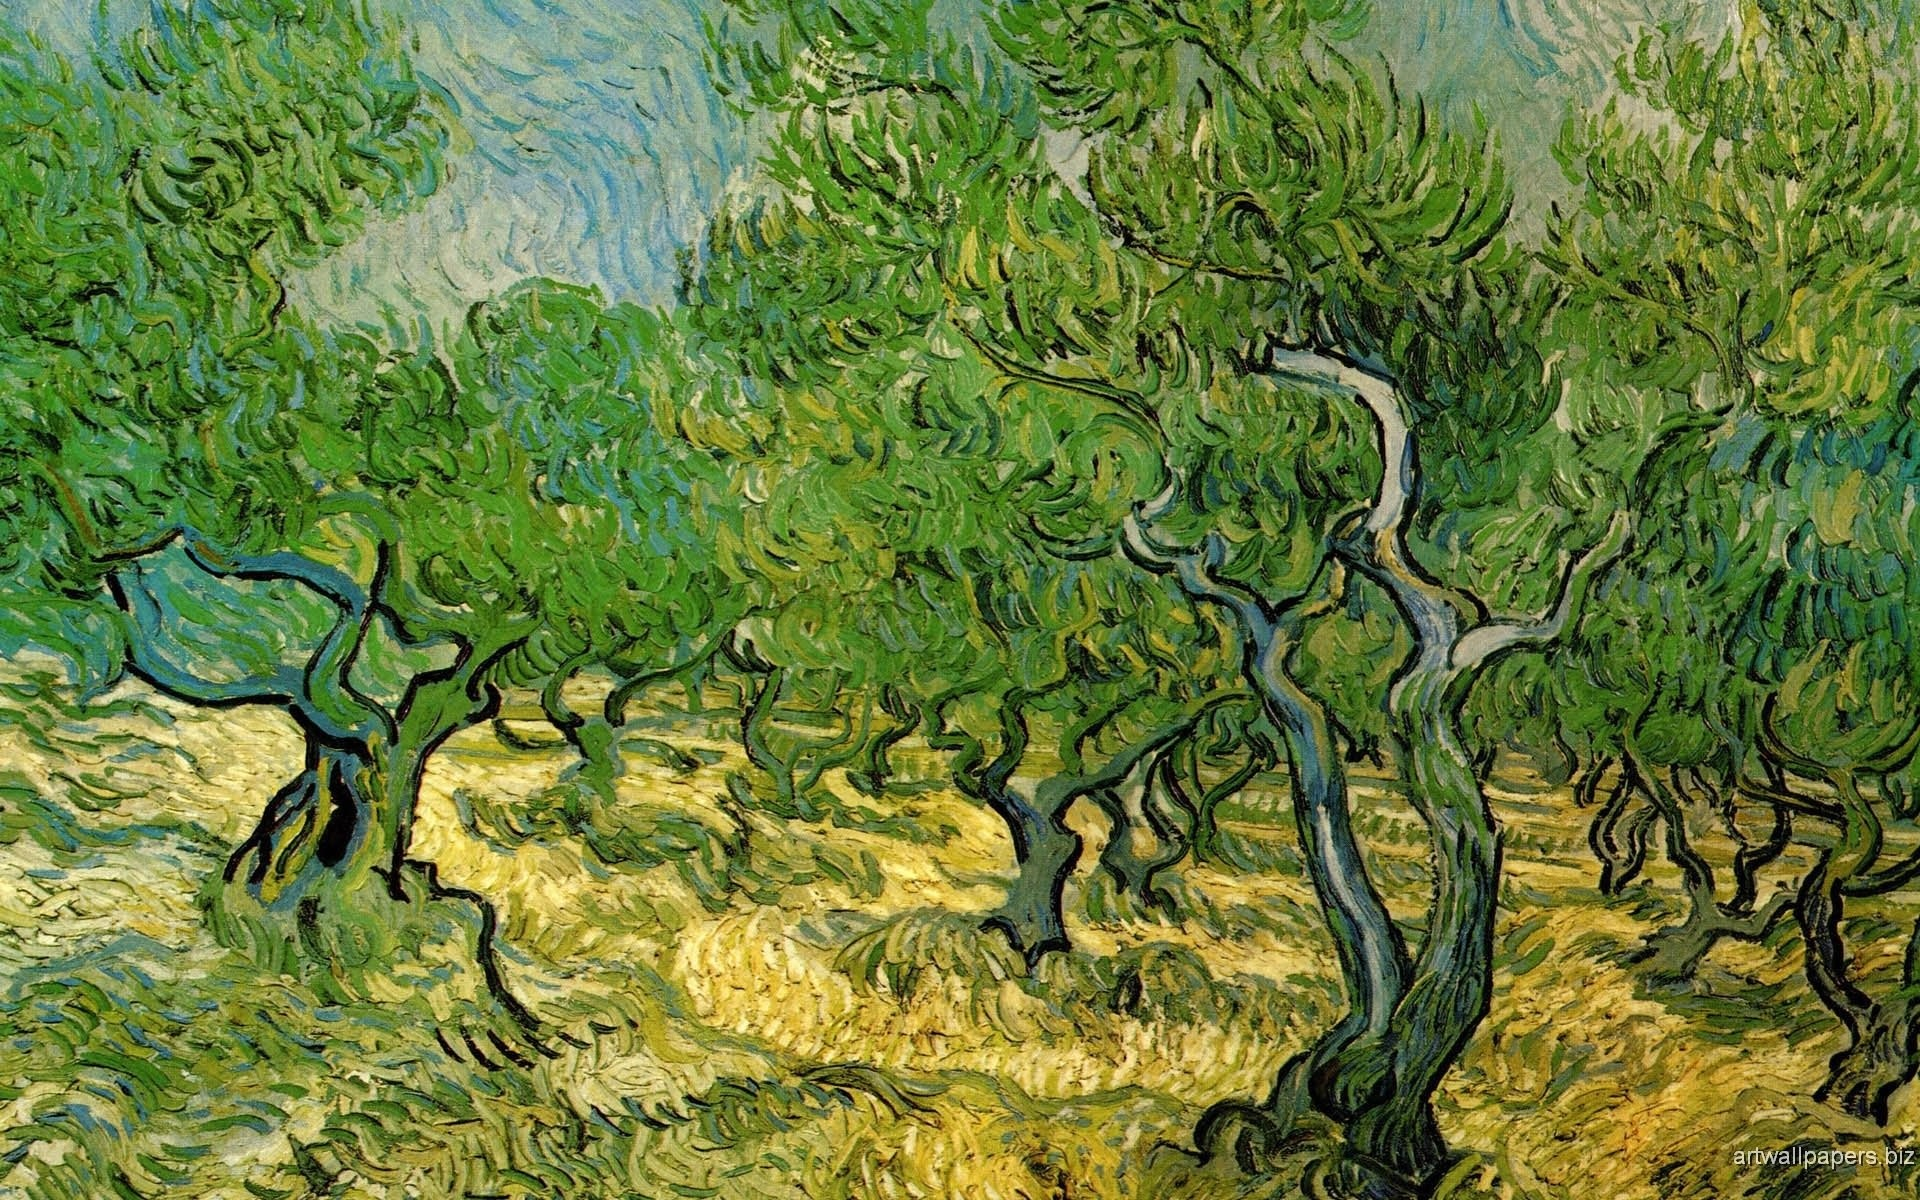 Tardis Wallpaper Iphone 6 Vincent Van Gogh Wallpapers 59 Images